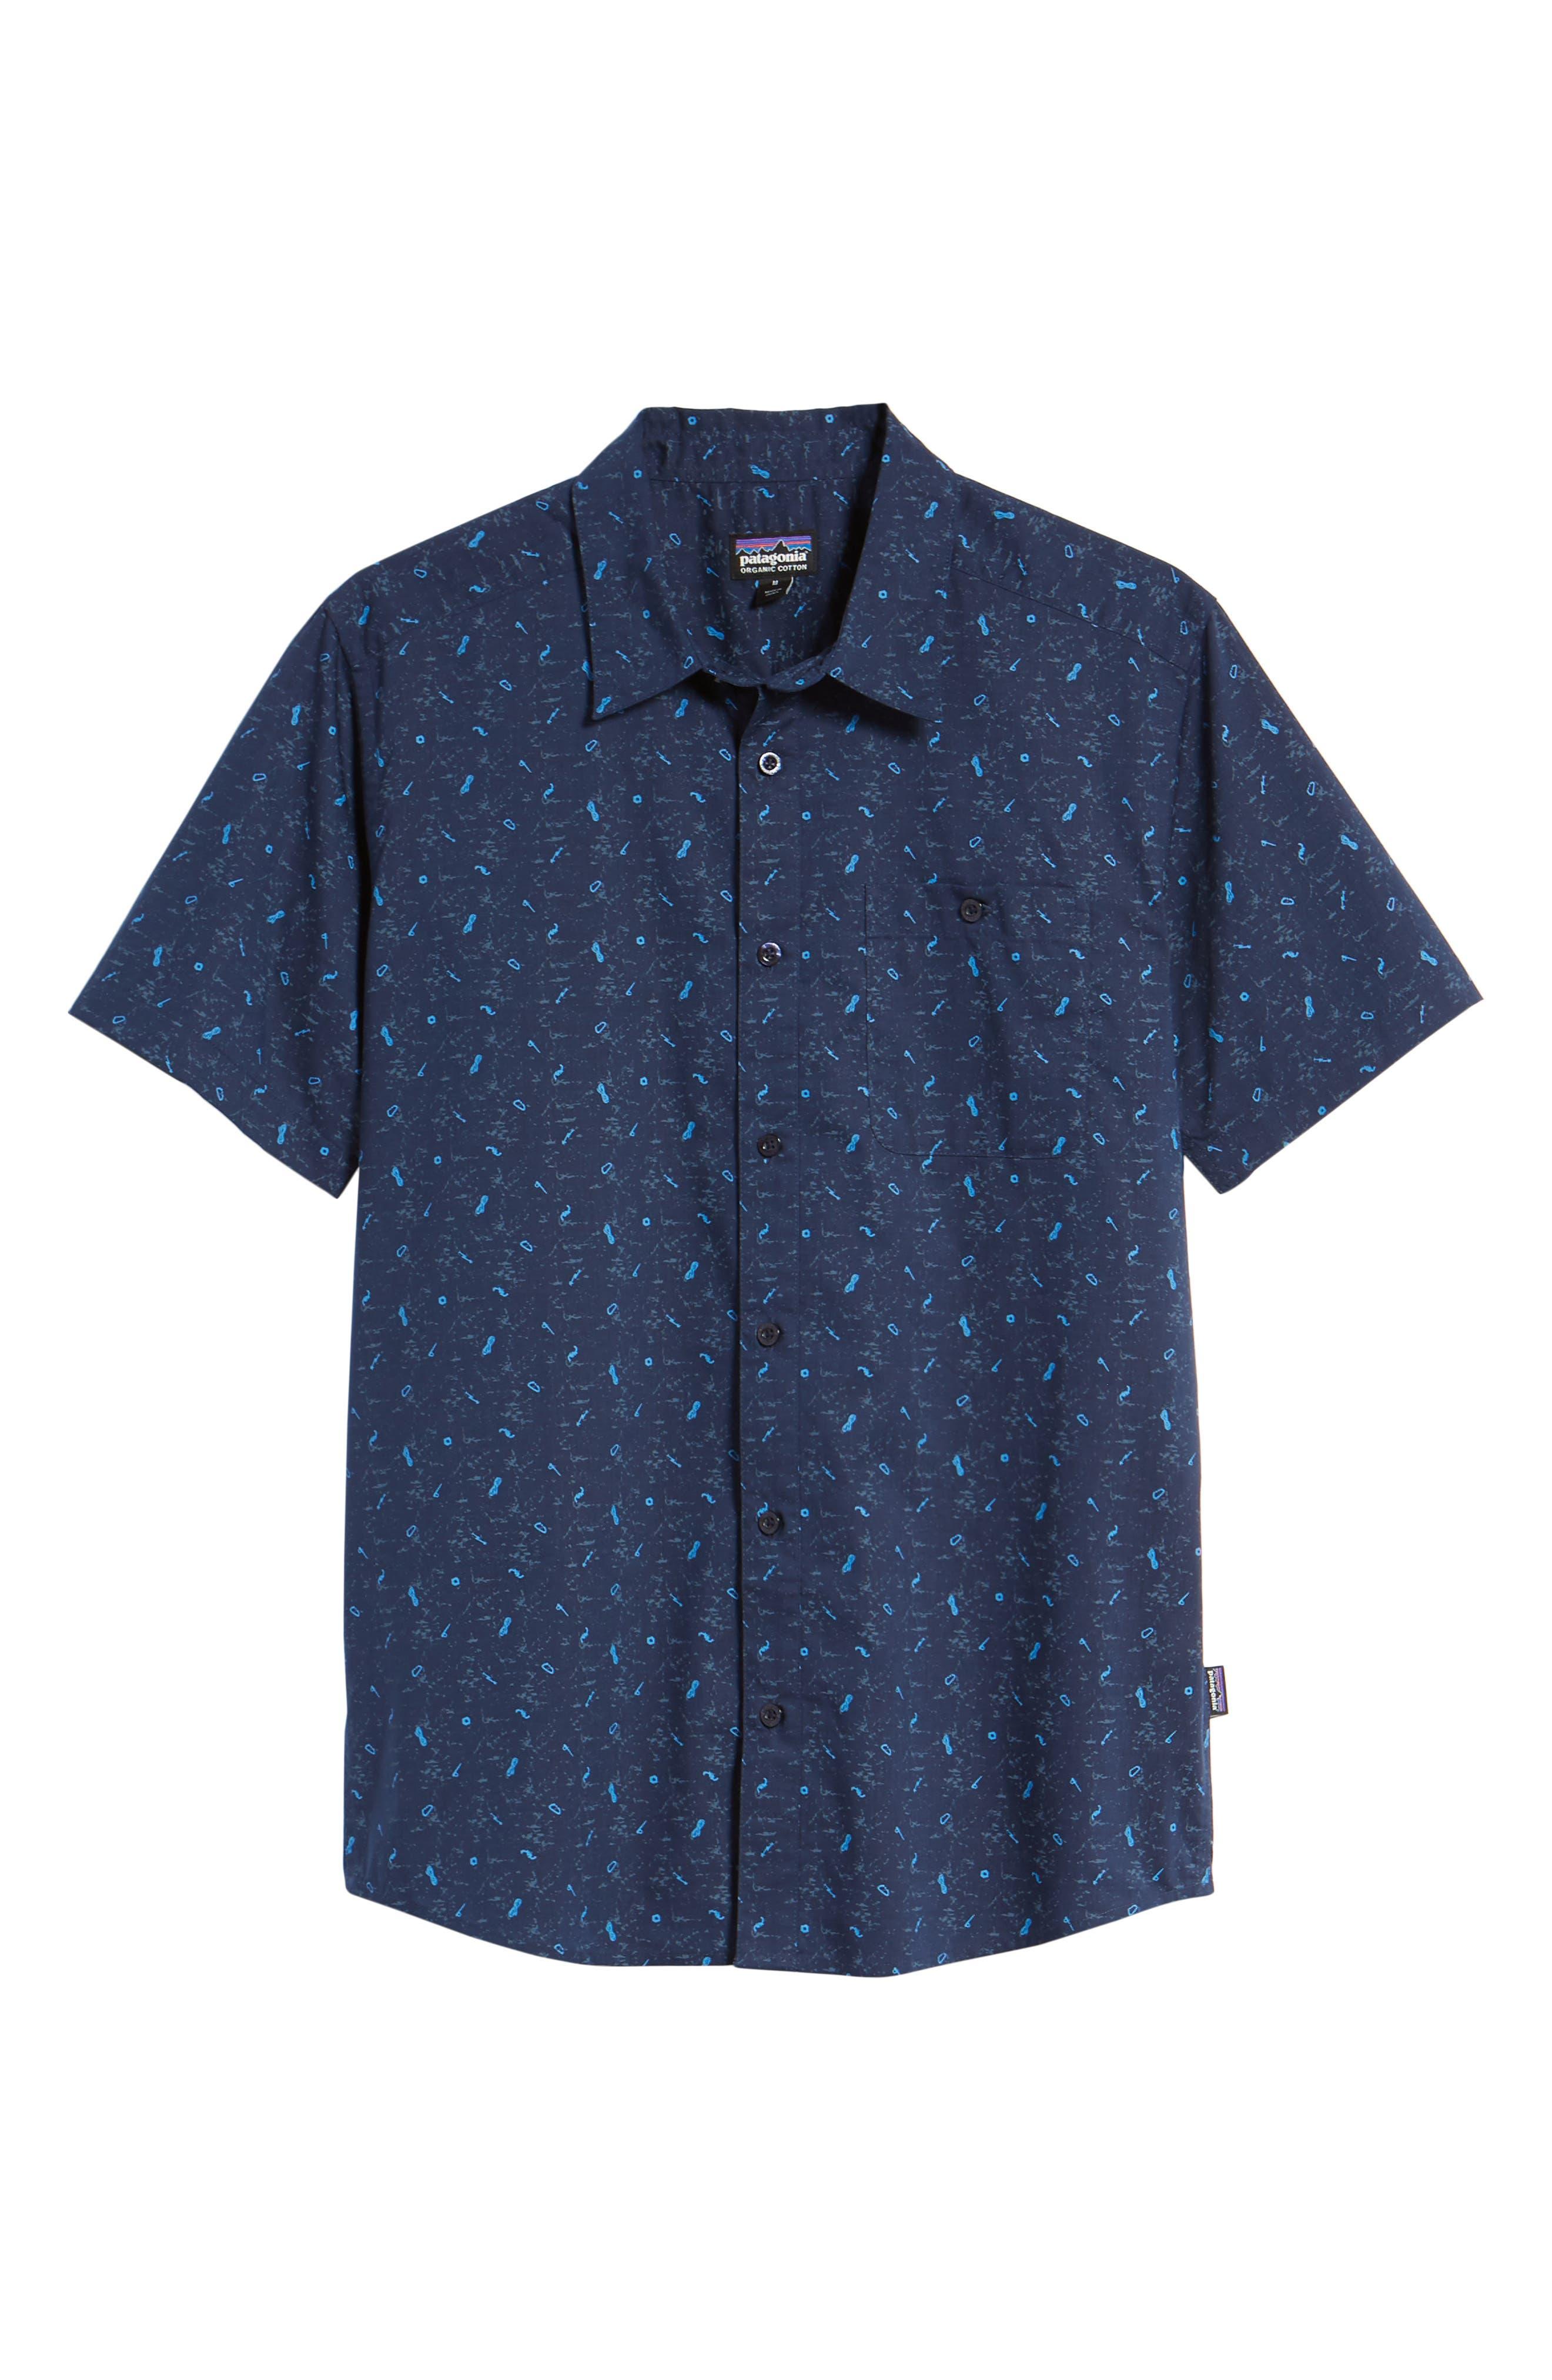 'Go To' Slim Fit Short Sleeve Sport Shirt,                             Alternate thumbnail 6, color,                             ROCKWALL/ CLASSIC NAVY